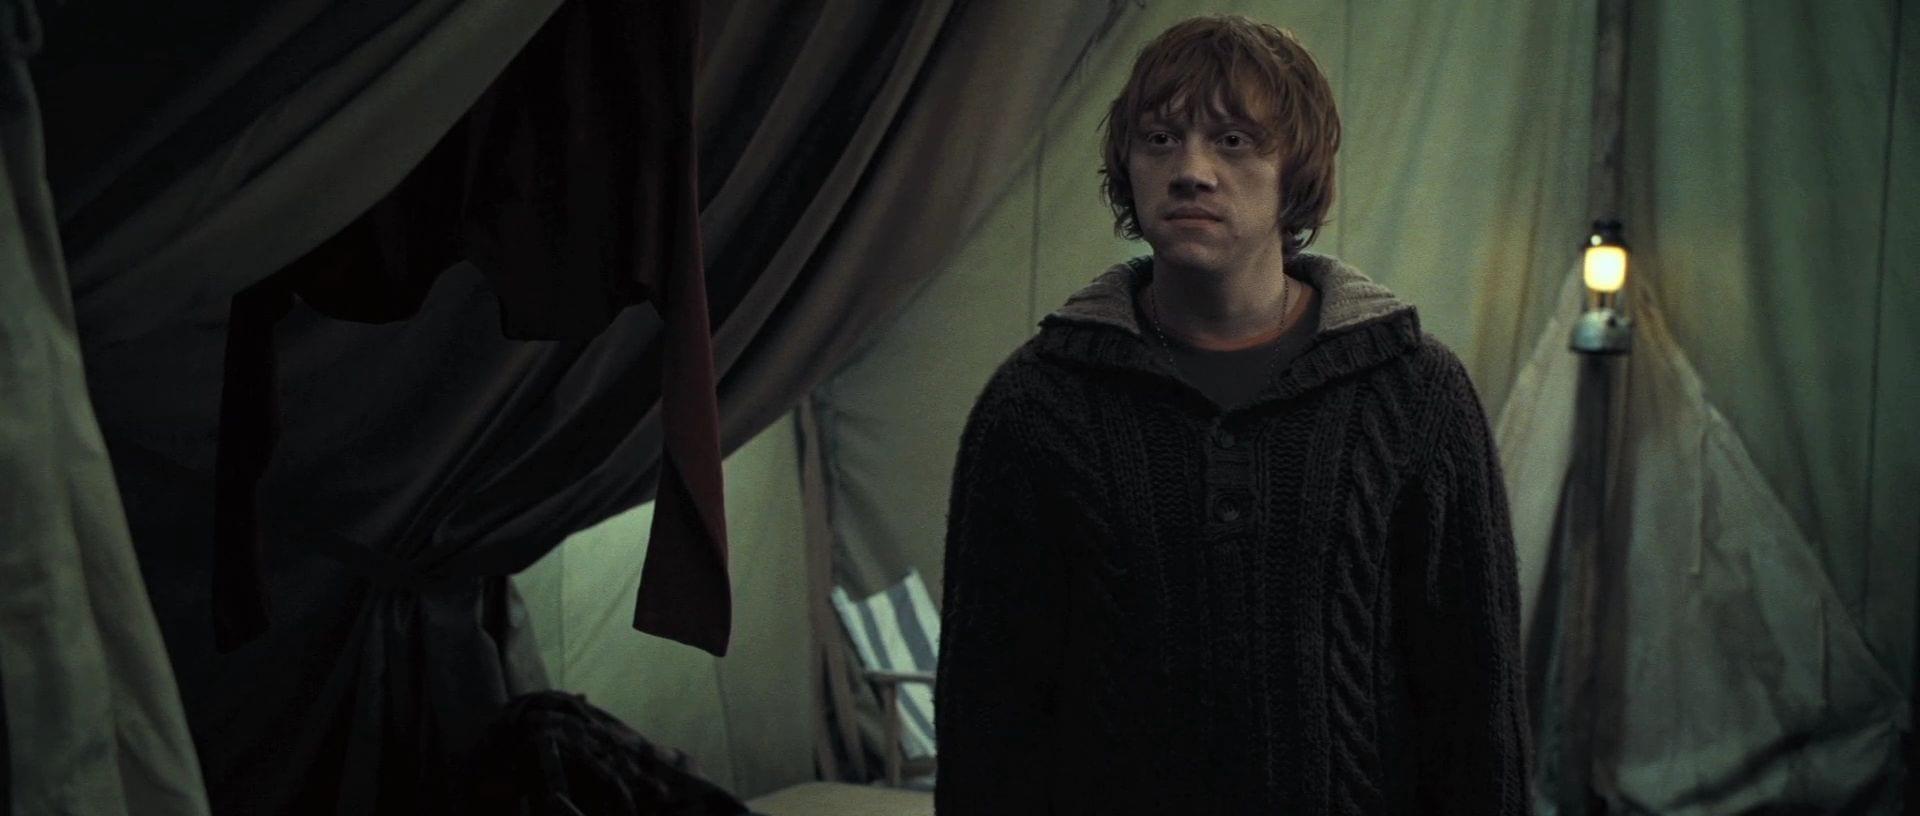 Top Mejores Frases de... Harry Potter y las Reliquias de la Muerte parte 1